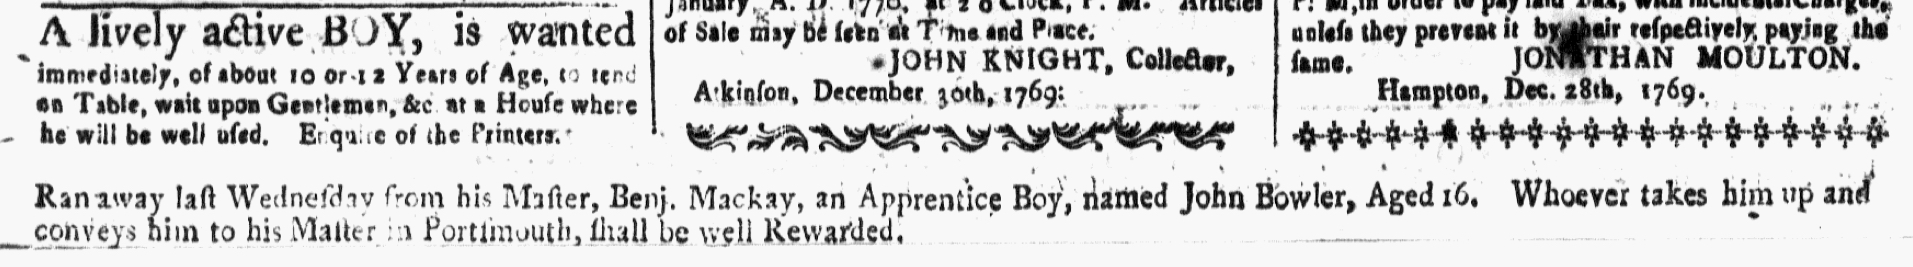 Jan 5 1770 - 1:5:1770 New-Hampshire Gazette